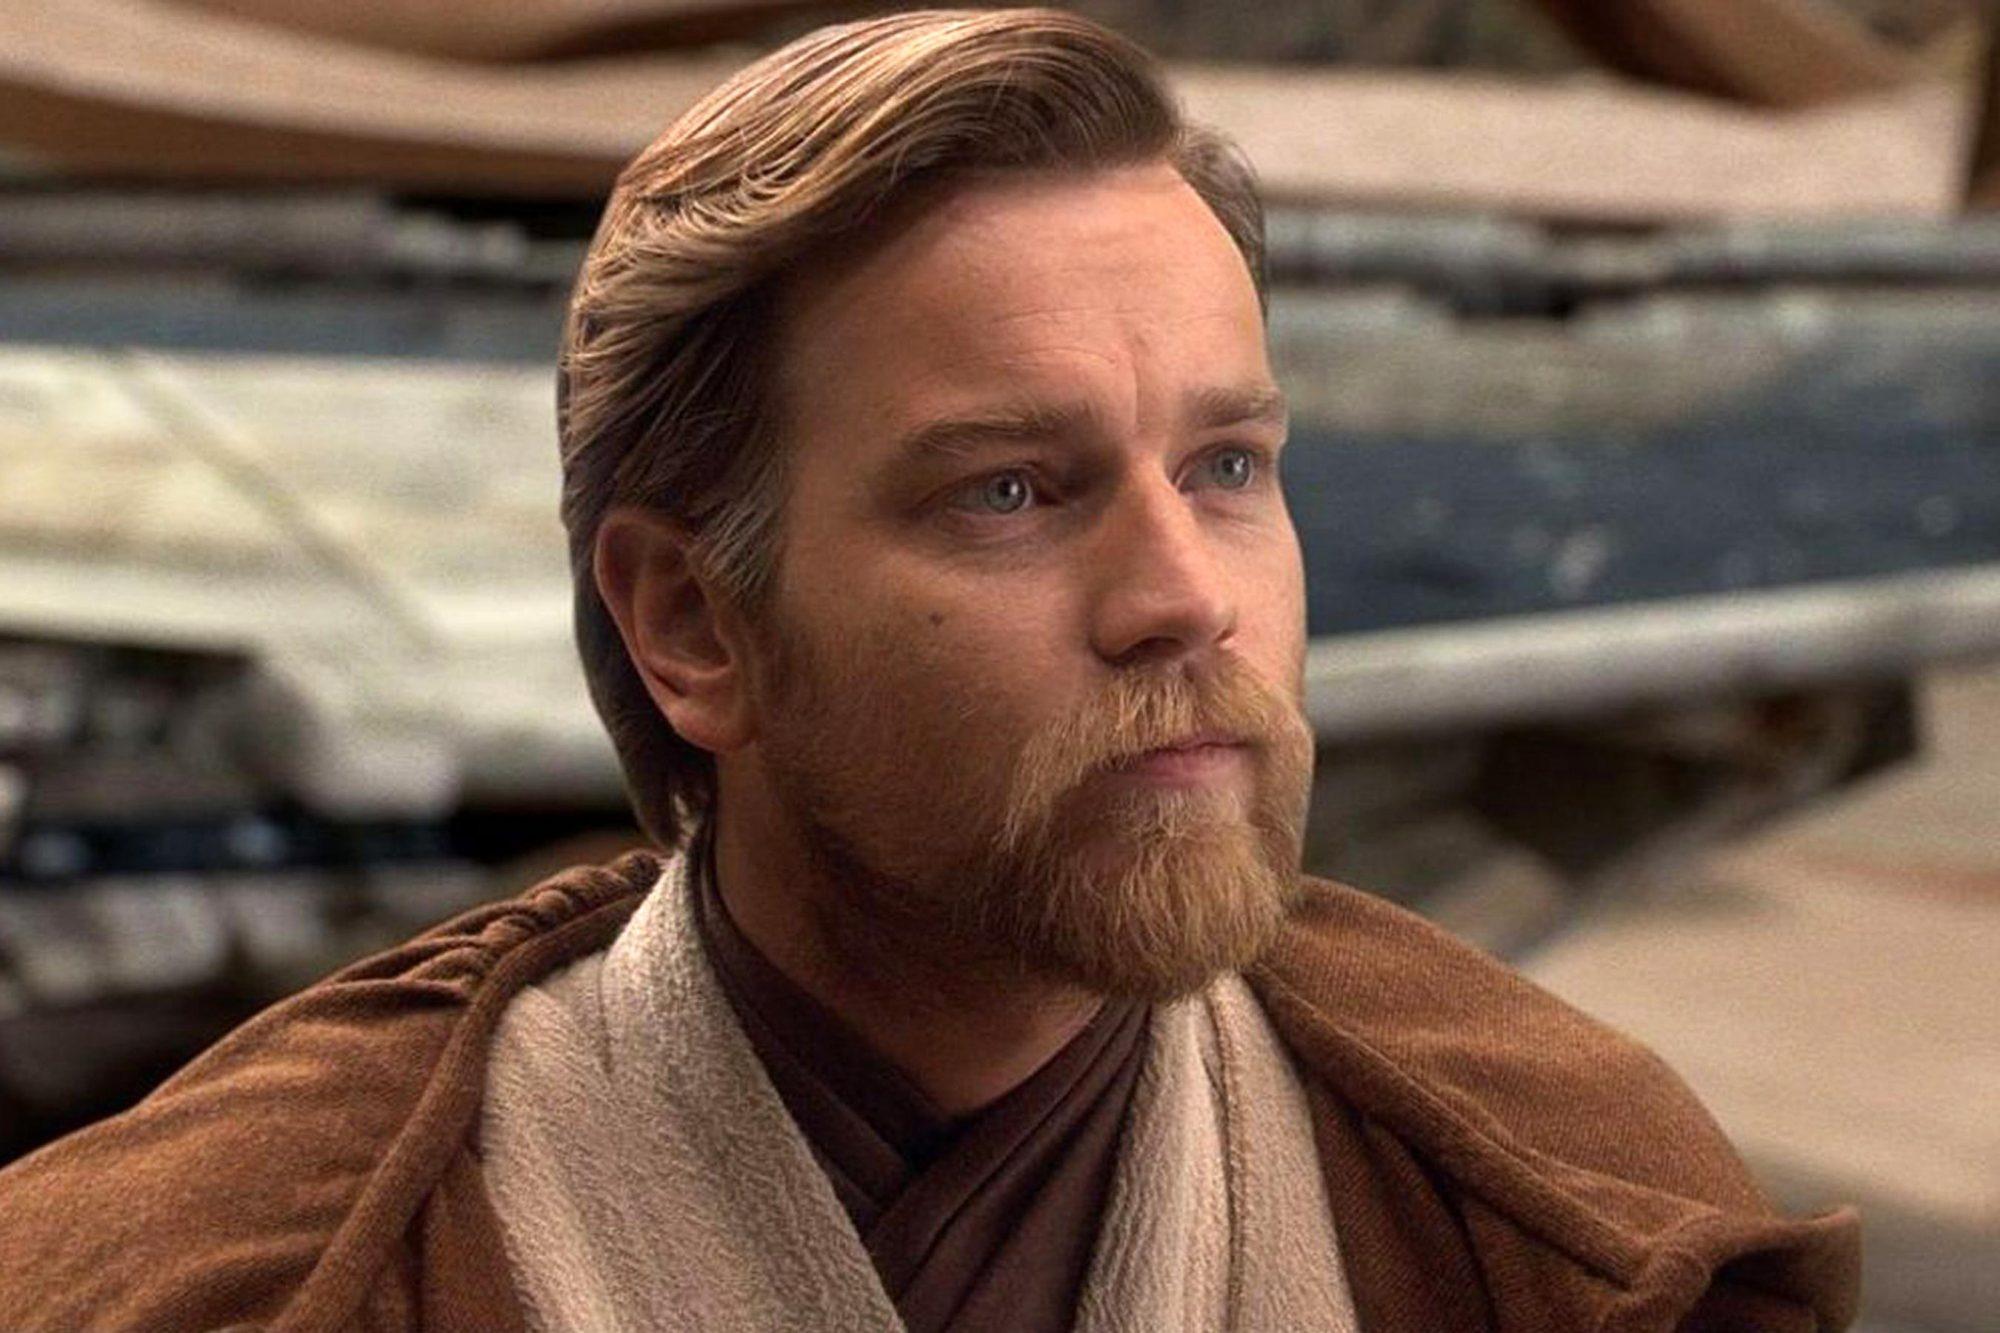 Disney confirms Obi-Wan Kenobi series with Ewan McGregor | EW.com